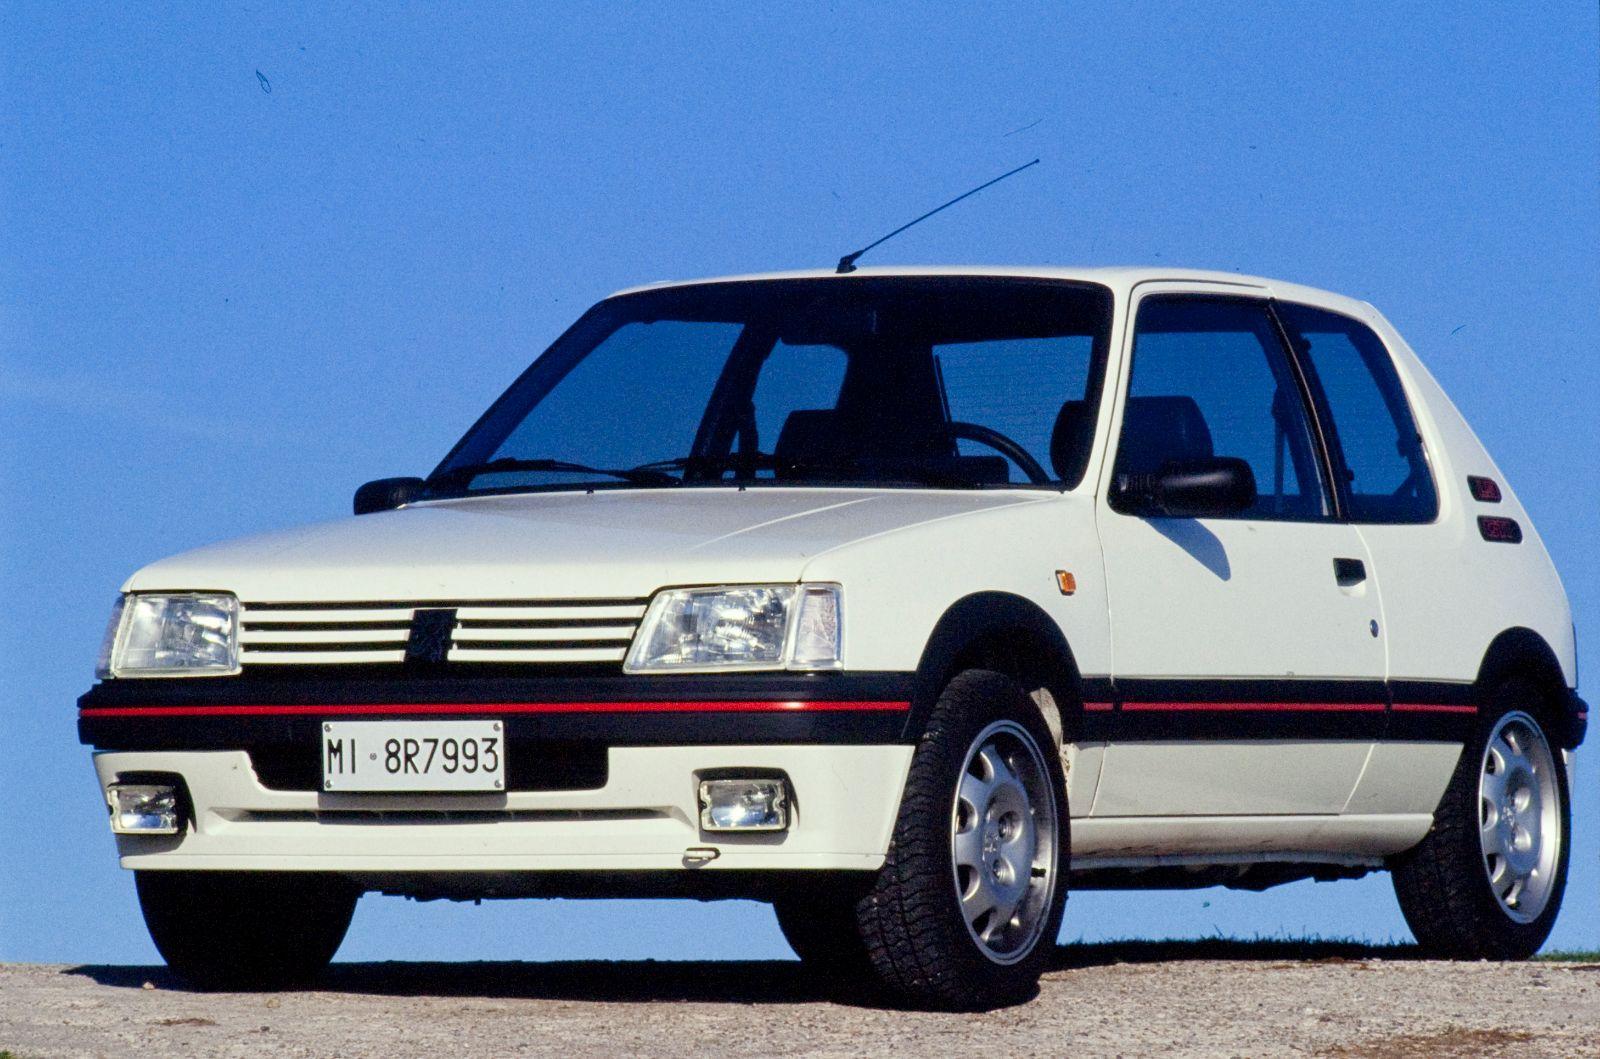 peugeot-205-gti-1-9-1990-1